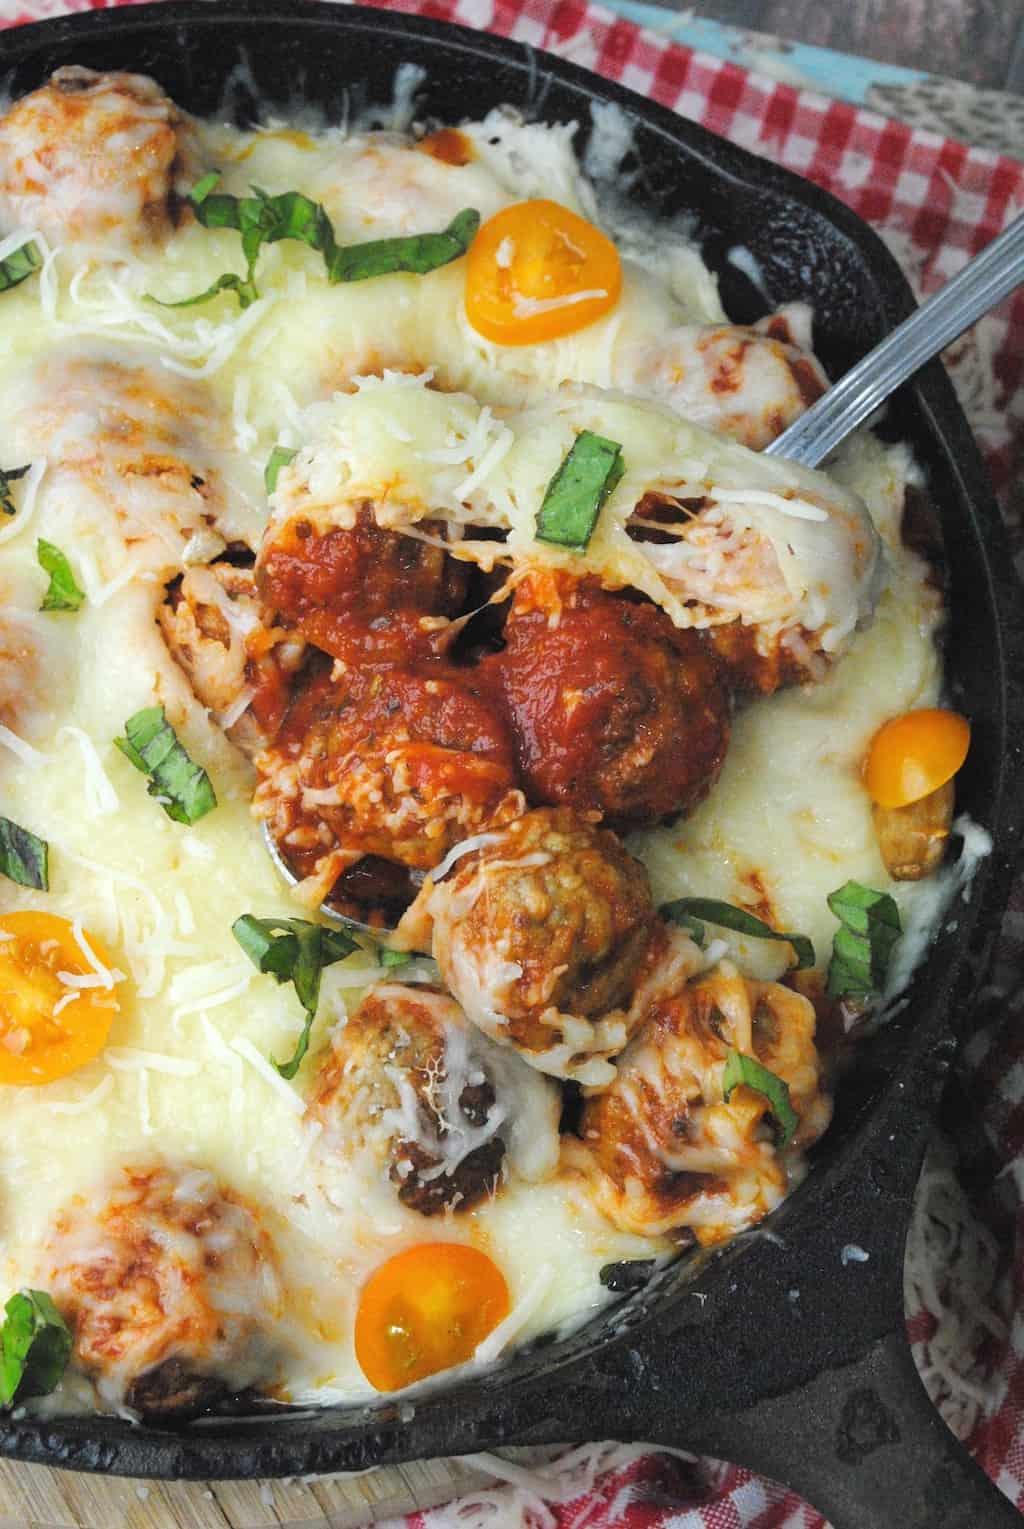 spaghetti and meatballs cast iron